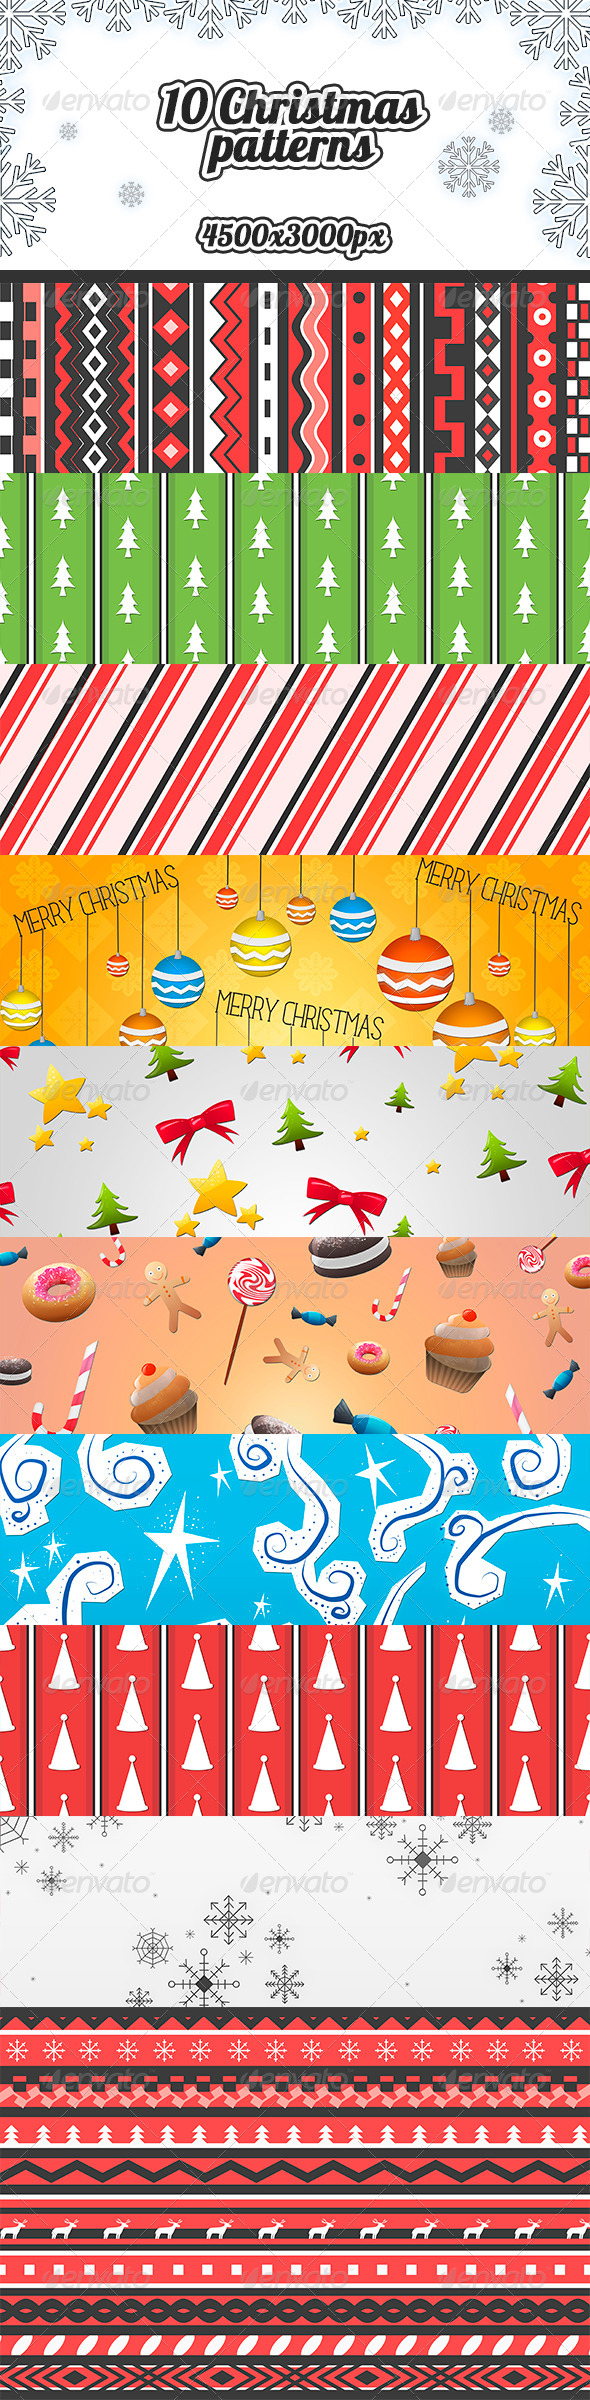 10 Christmas Patterns